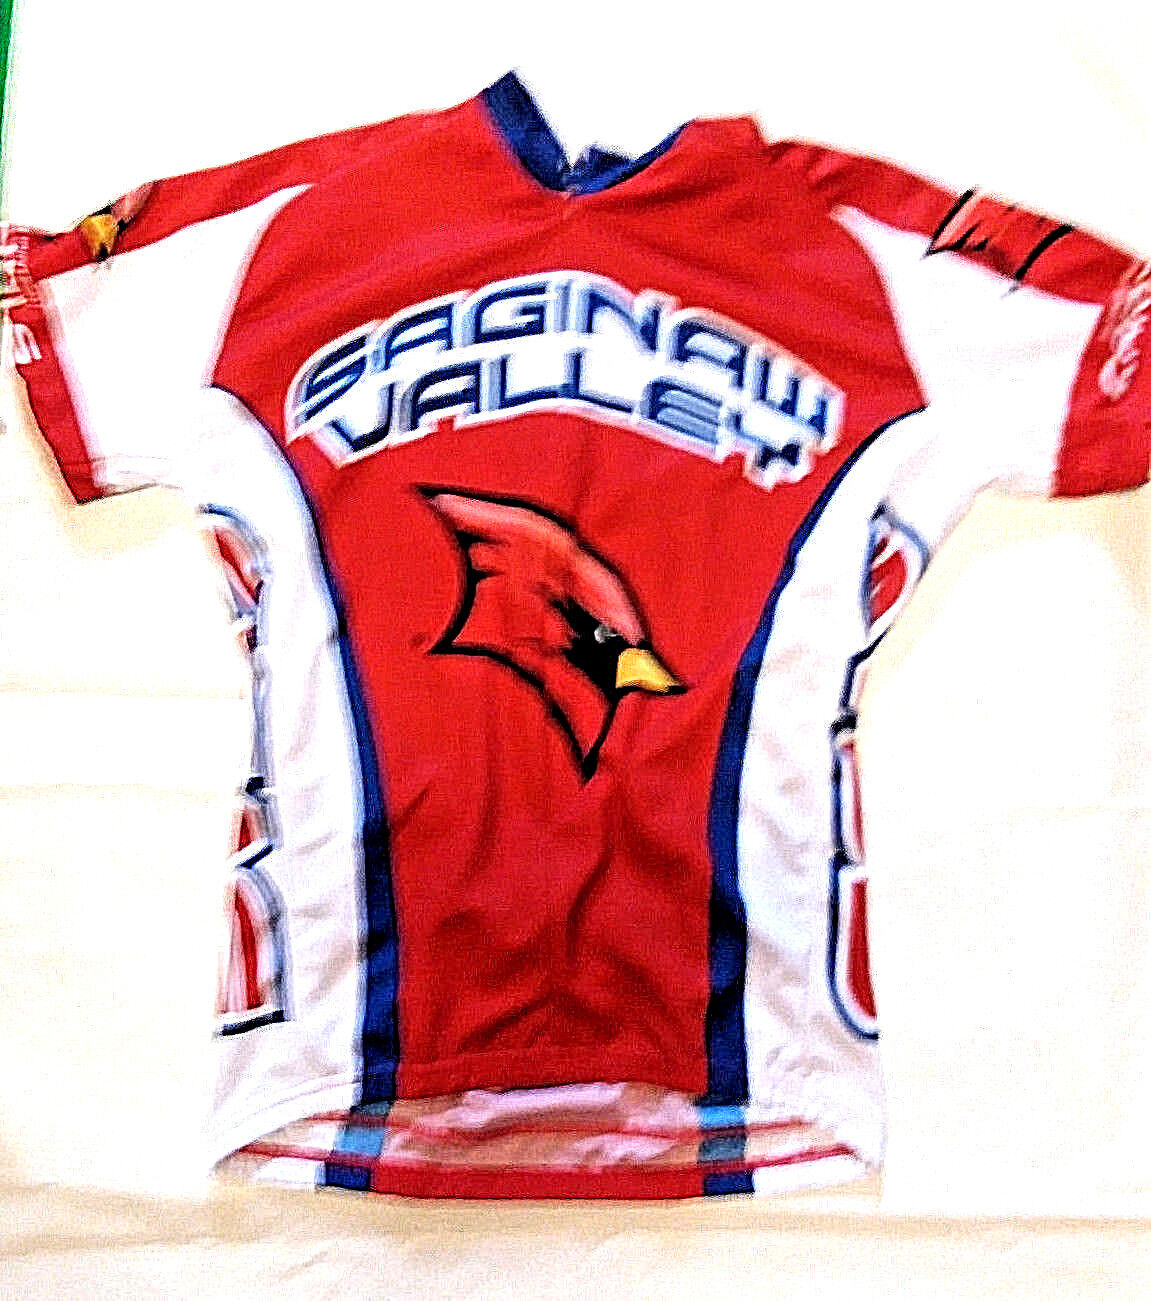 Saginaw Valley State University Short Sleeve Cycling Jersey